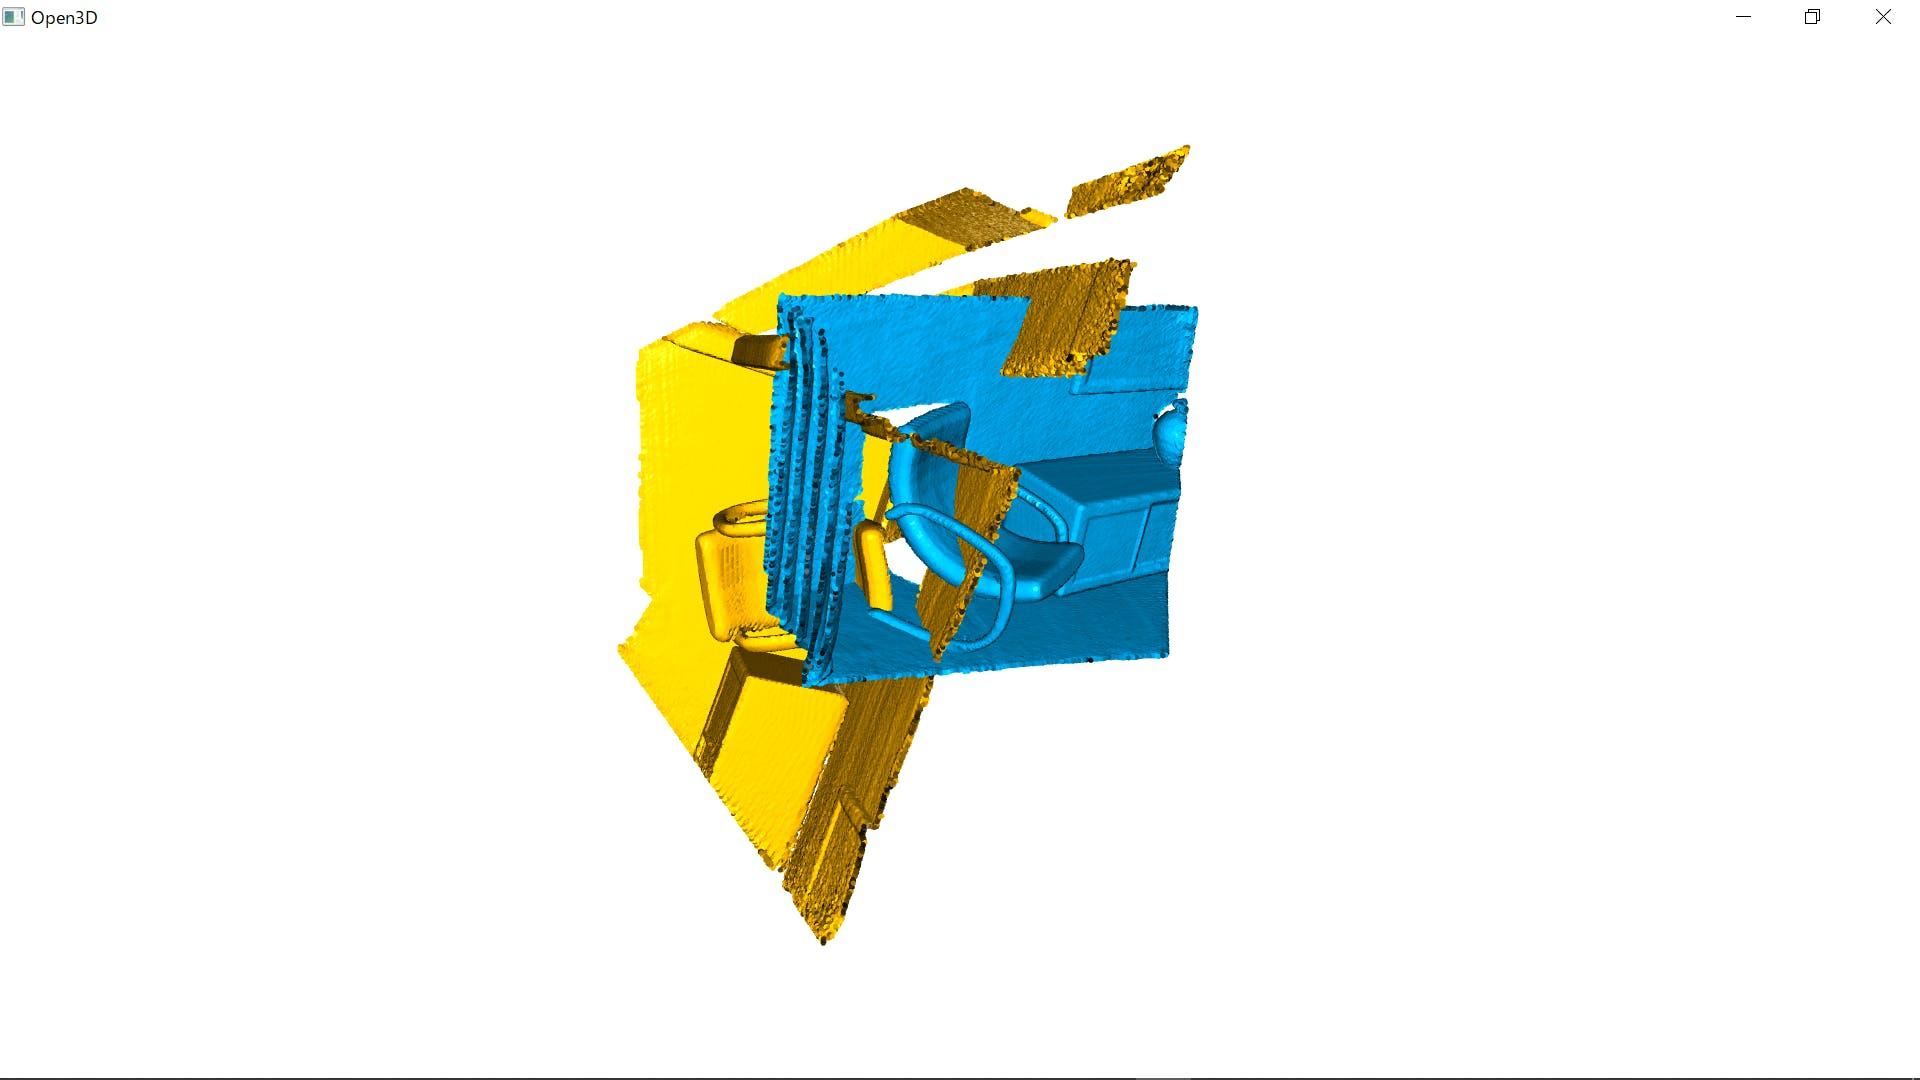 Triangle Mesh Open3d